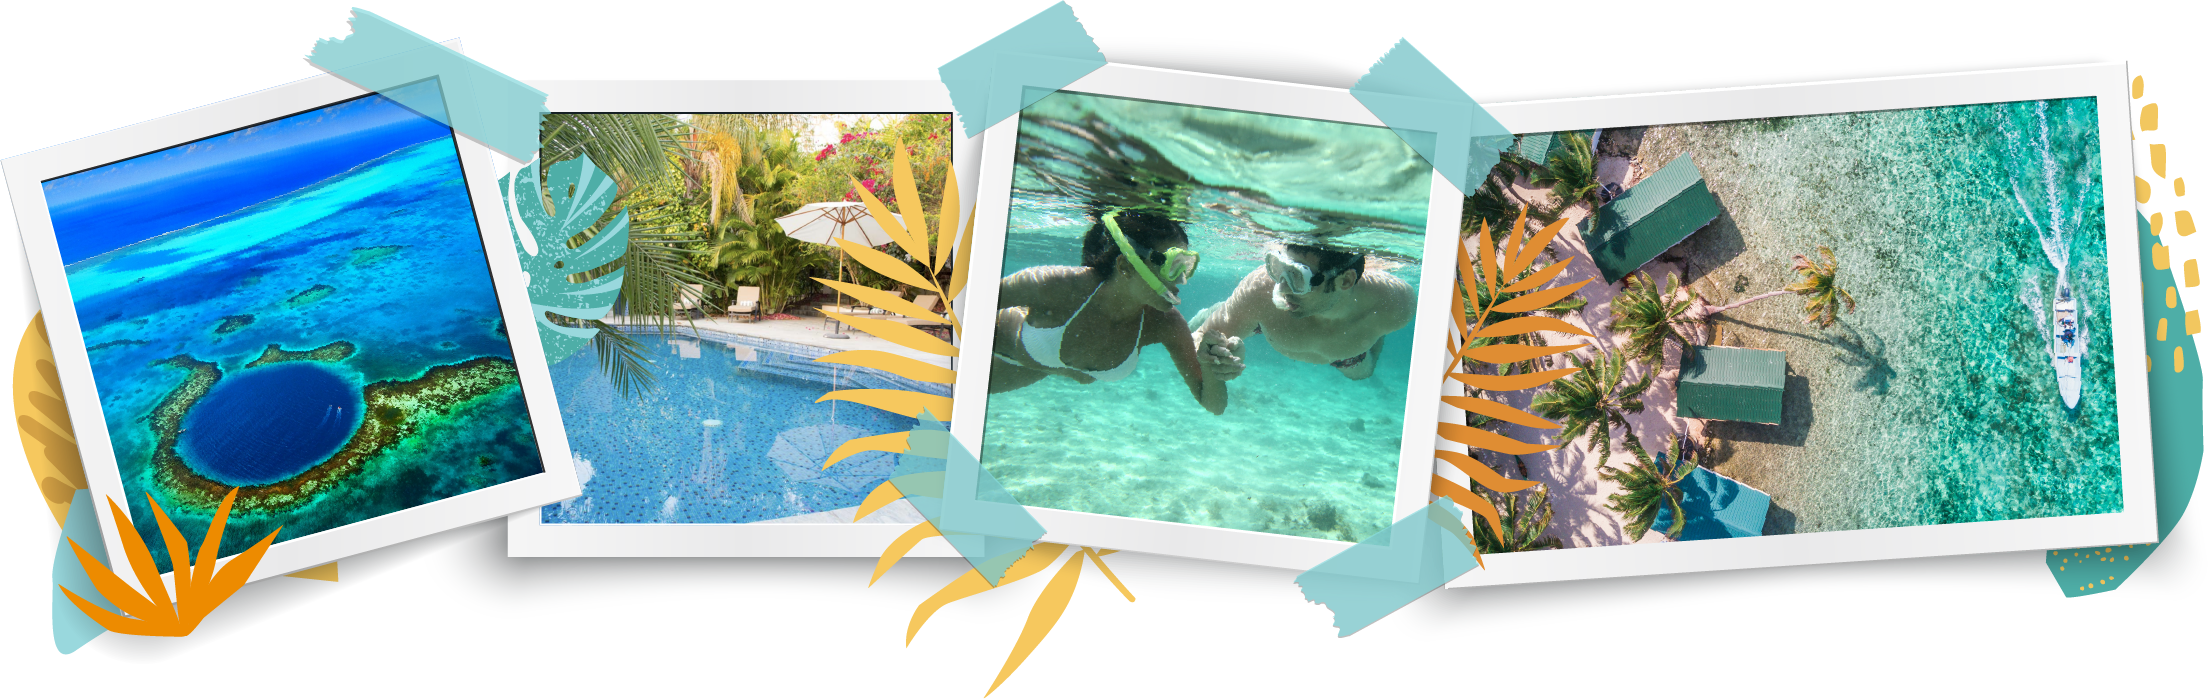 Honeymoon in Belize with Fox World Travel